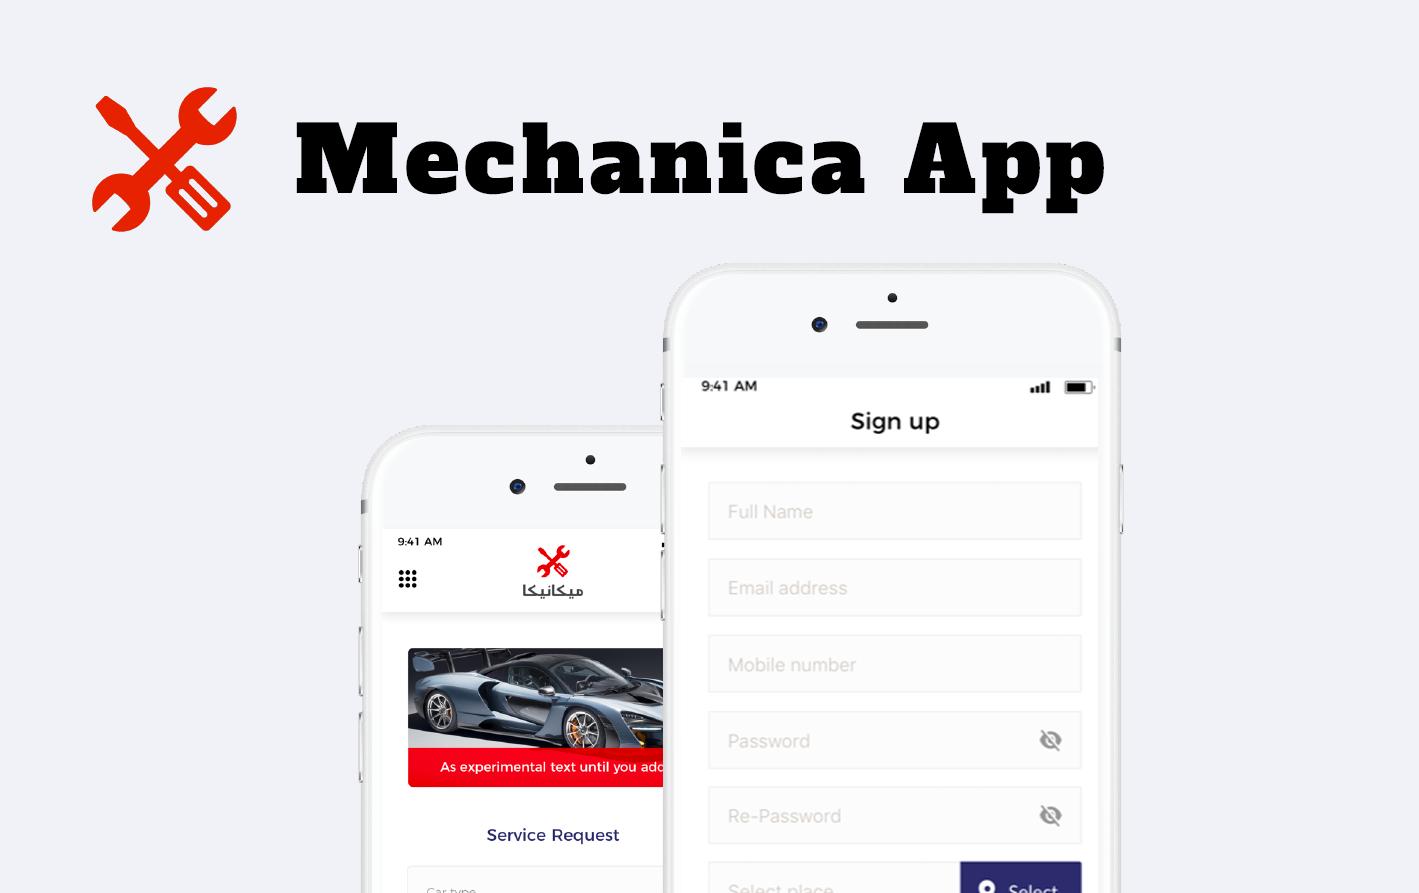 Mechanica App